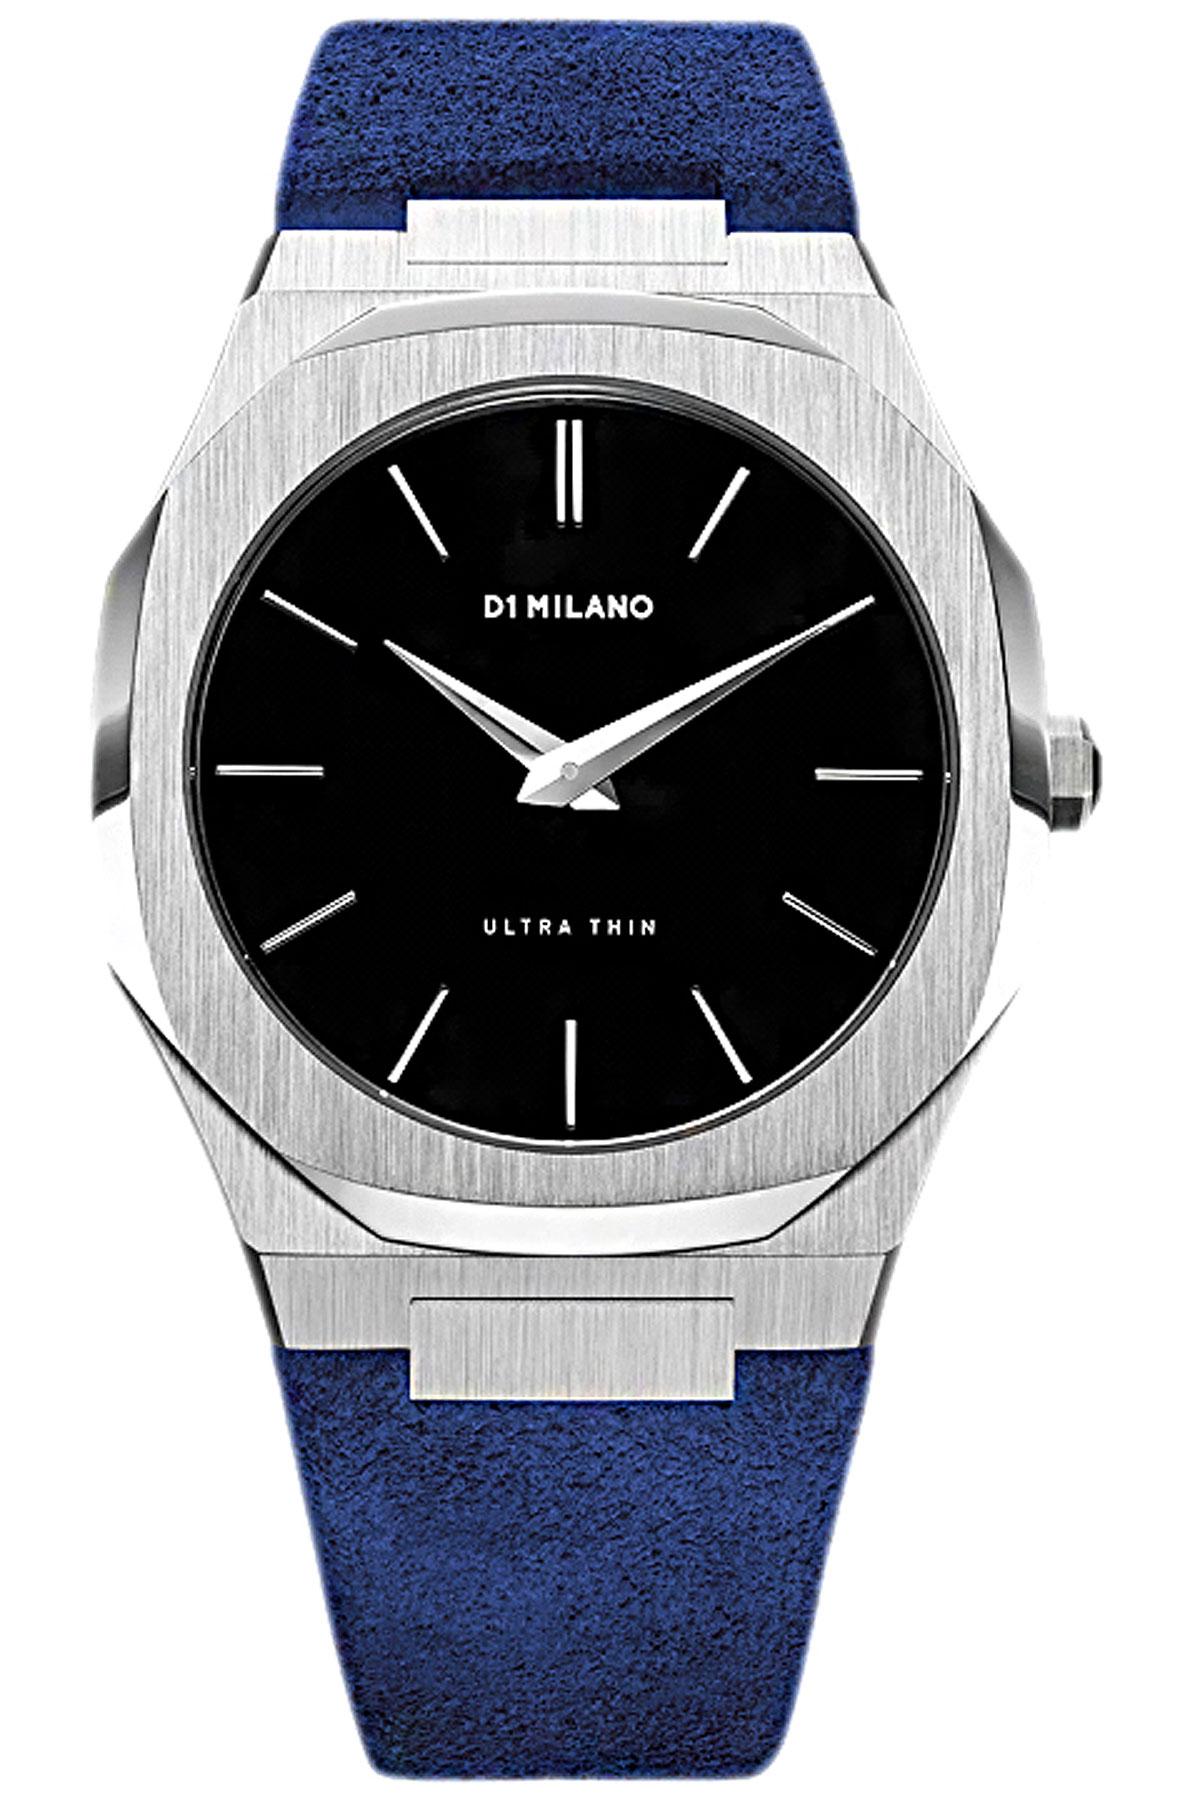 D1 Milano Watch for Men, Capri Blue, Suede leather, 2019